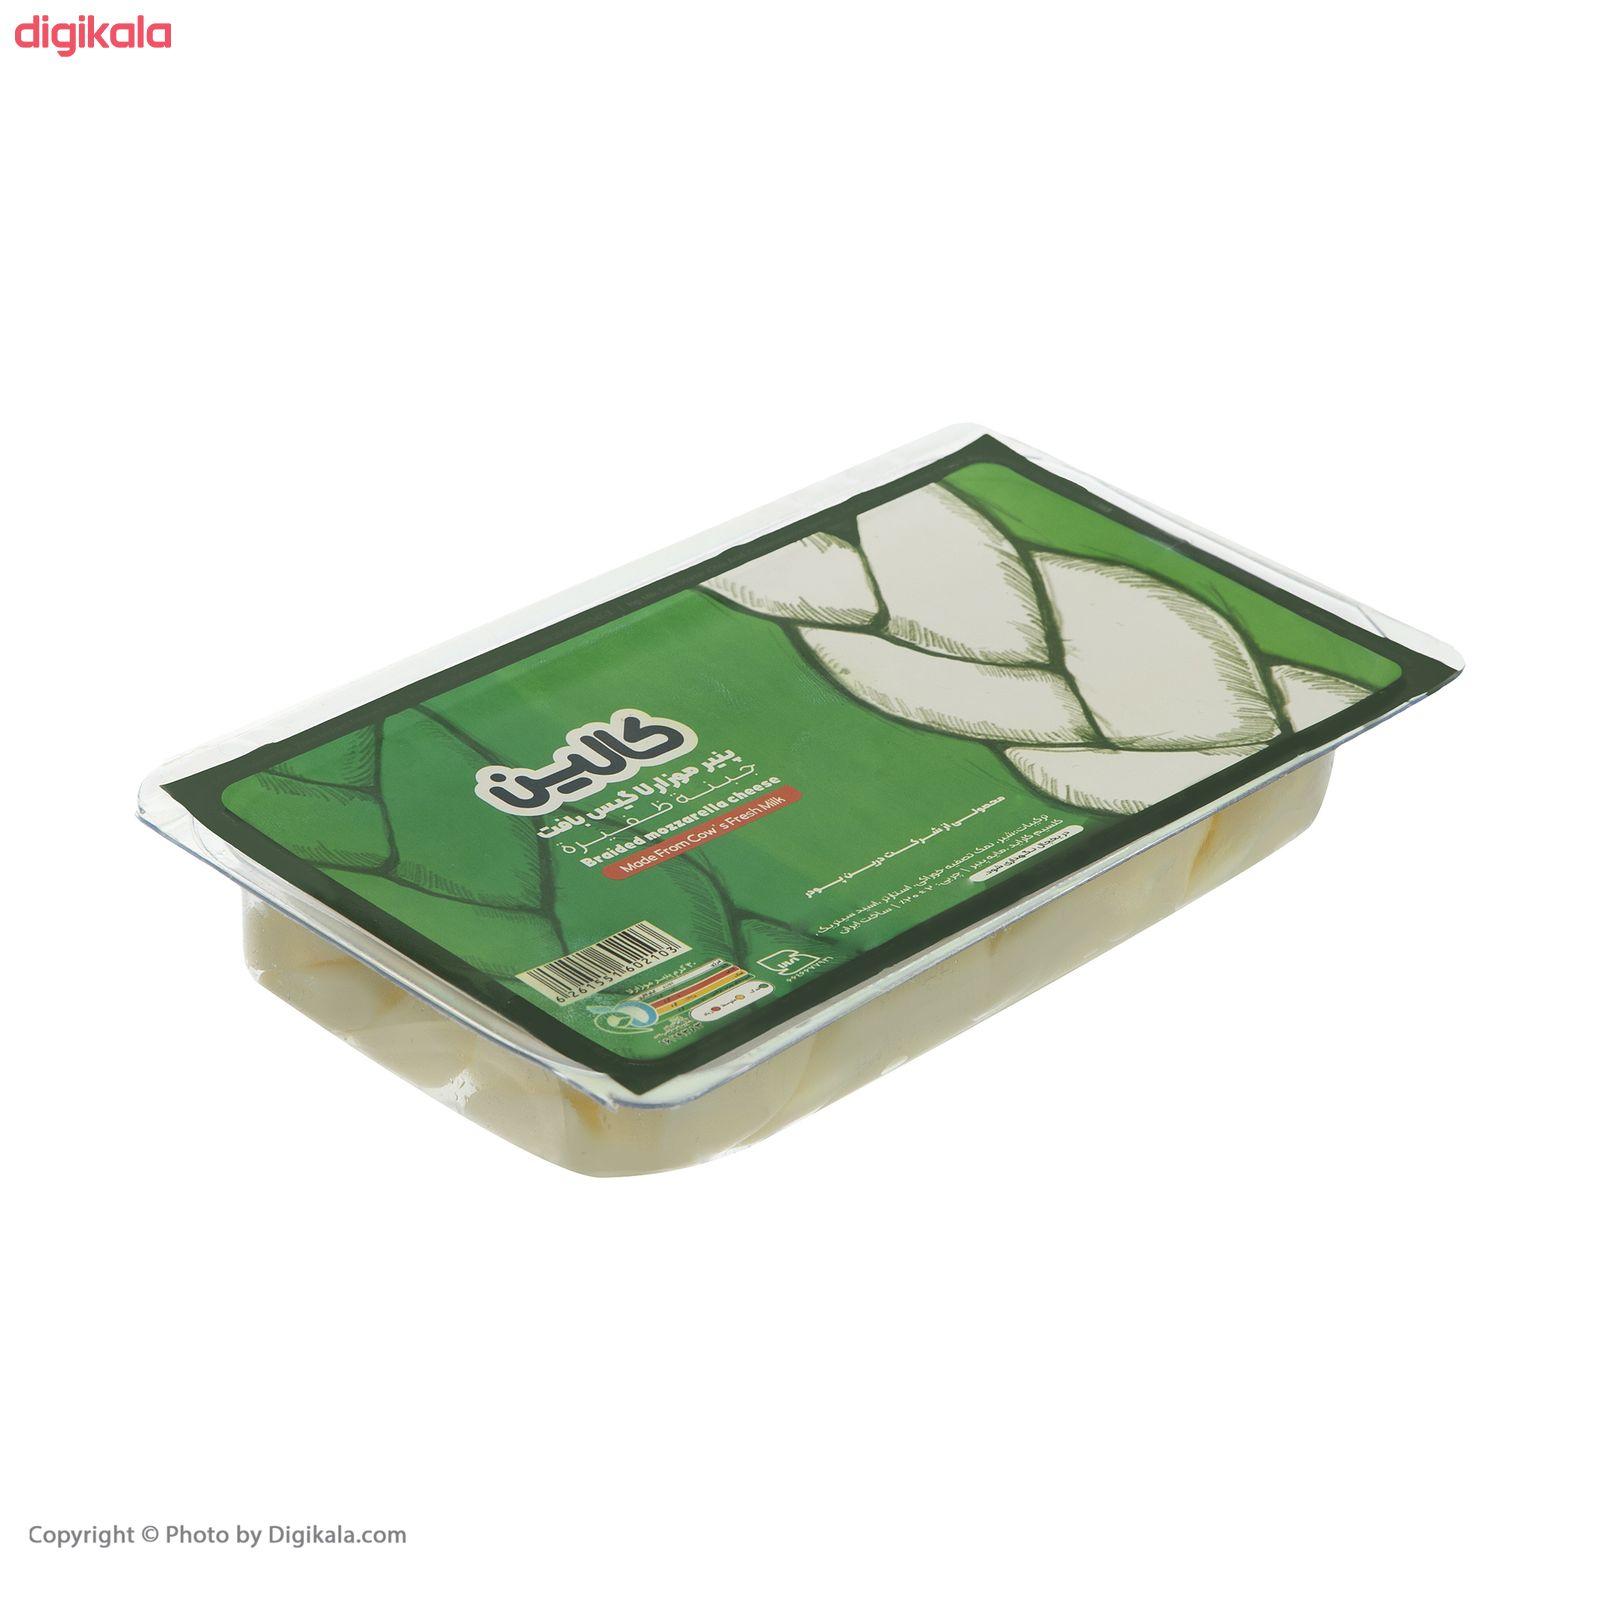 پنیر موزارلا گیس بافت کالین - 200 گرم main 1 4